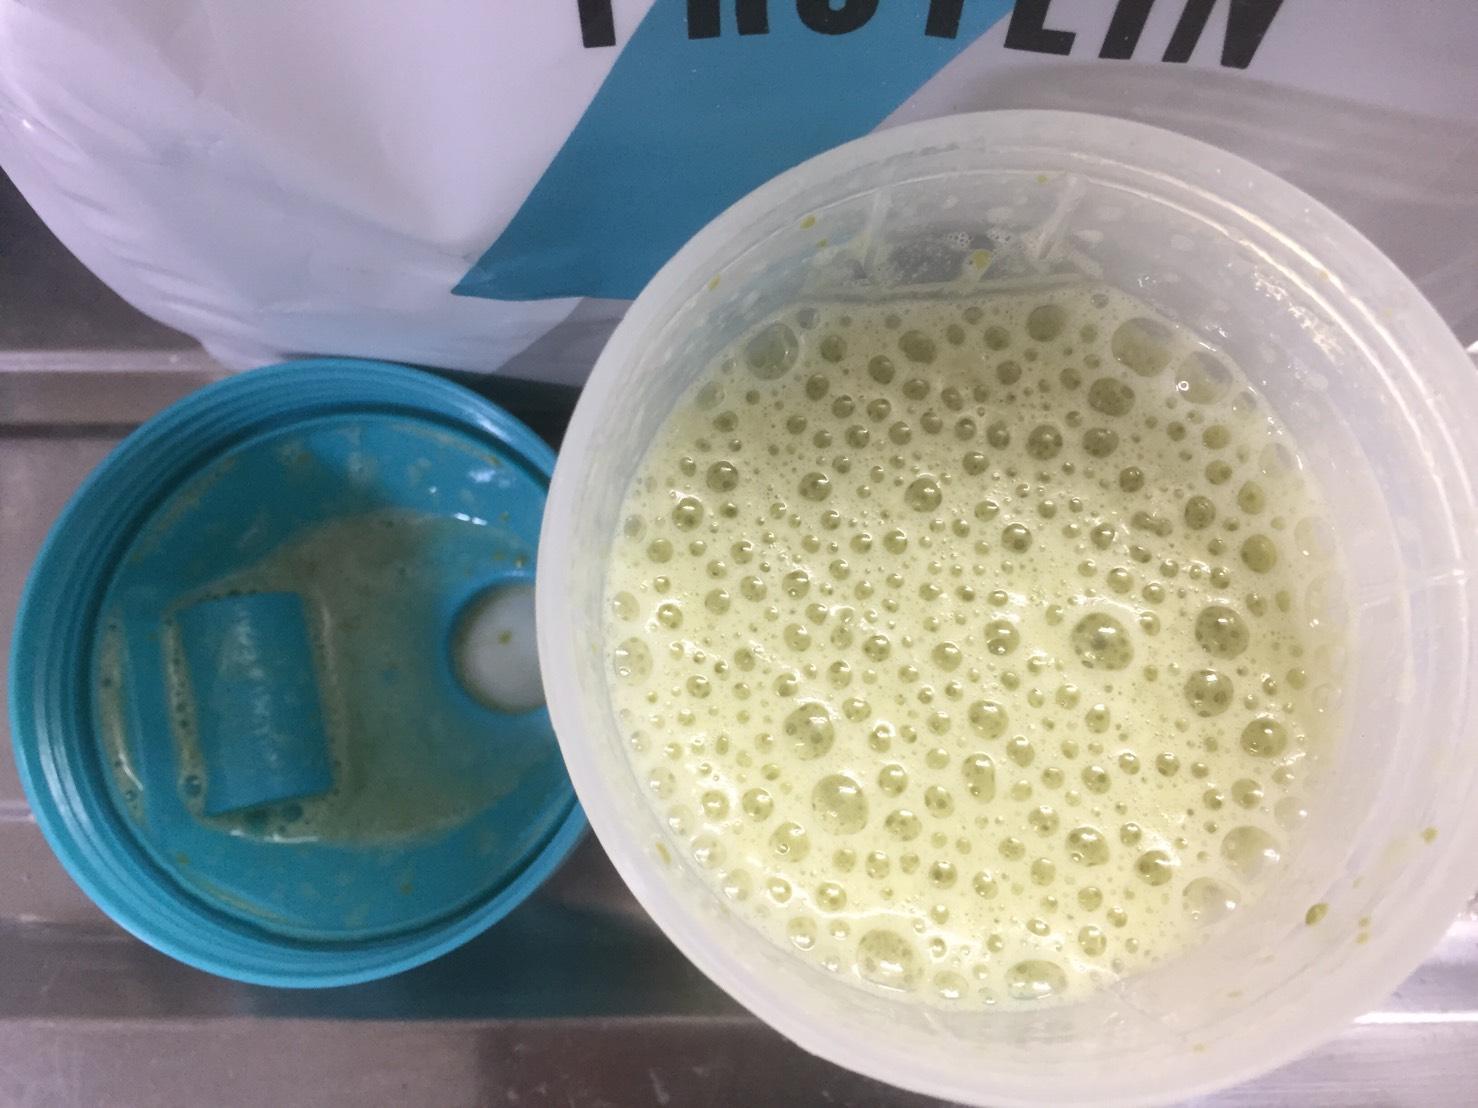 Impactホエイプロテイン:抹茶ラテ味を250mlの水で溶かした様子